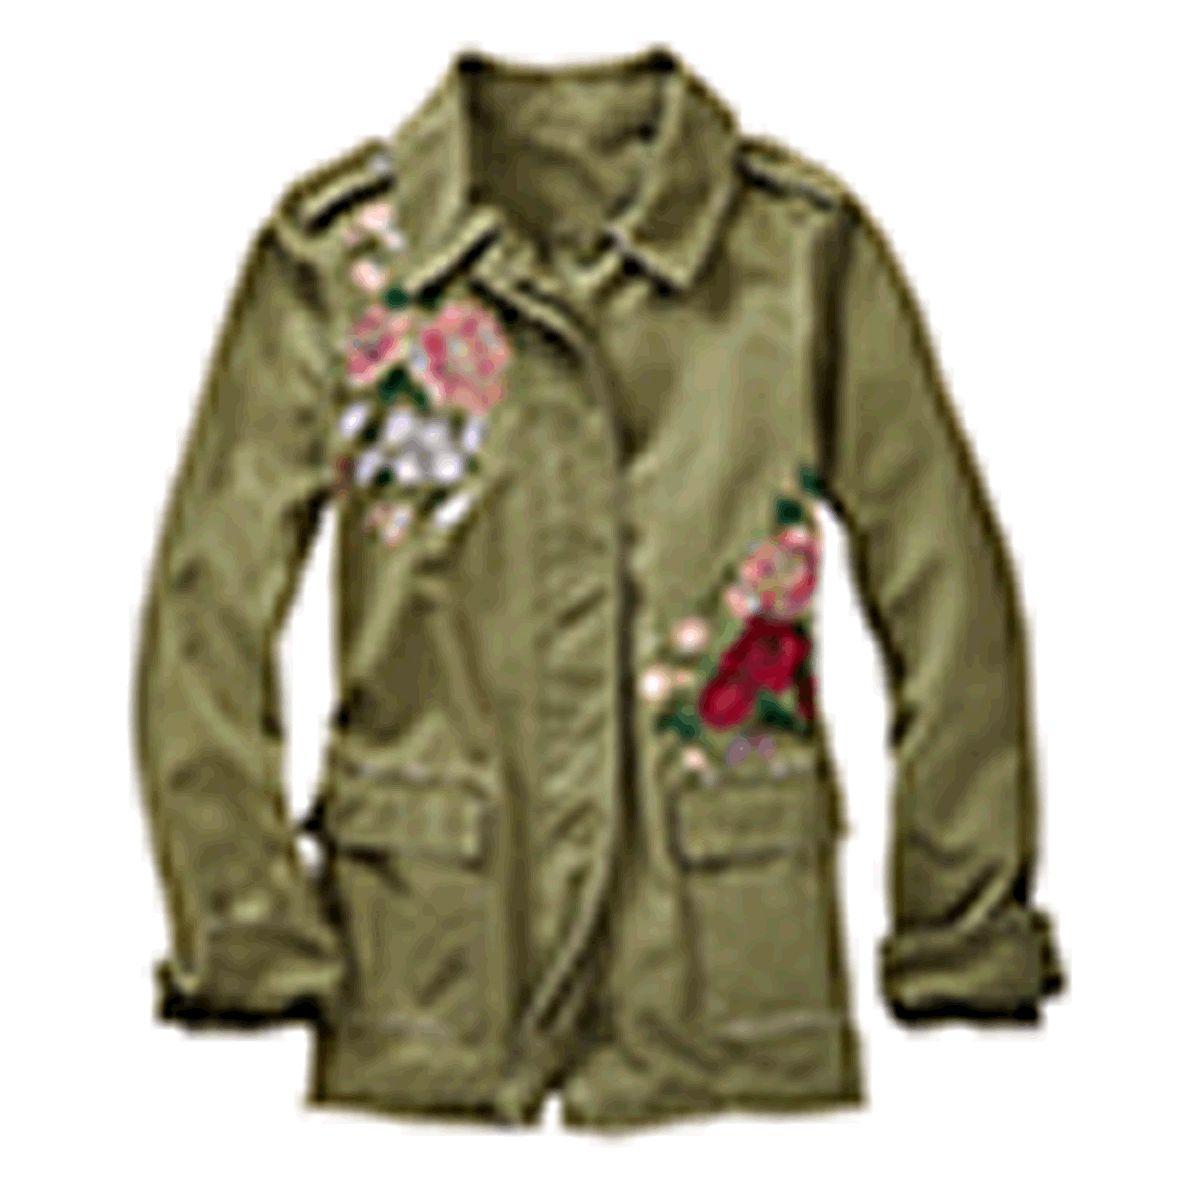 8aa213580e0 American Rag Juniors Clothing - Dresses   Jeans - Macy s